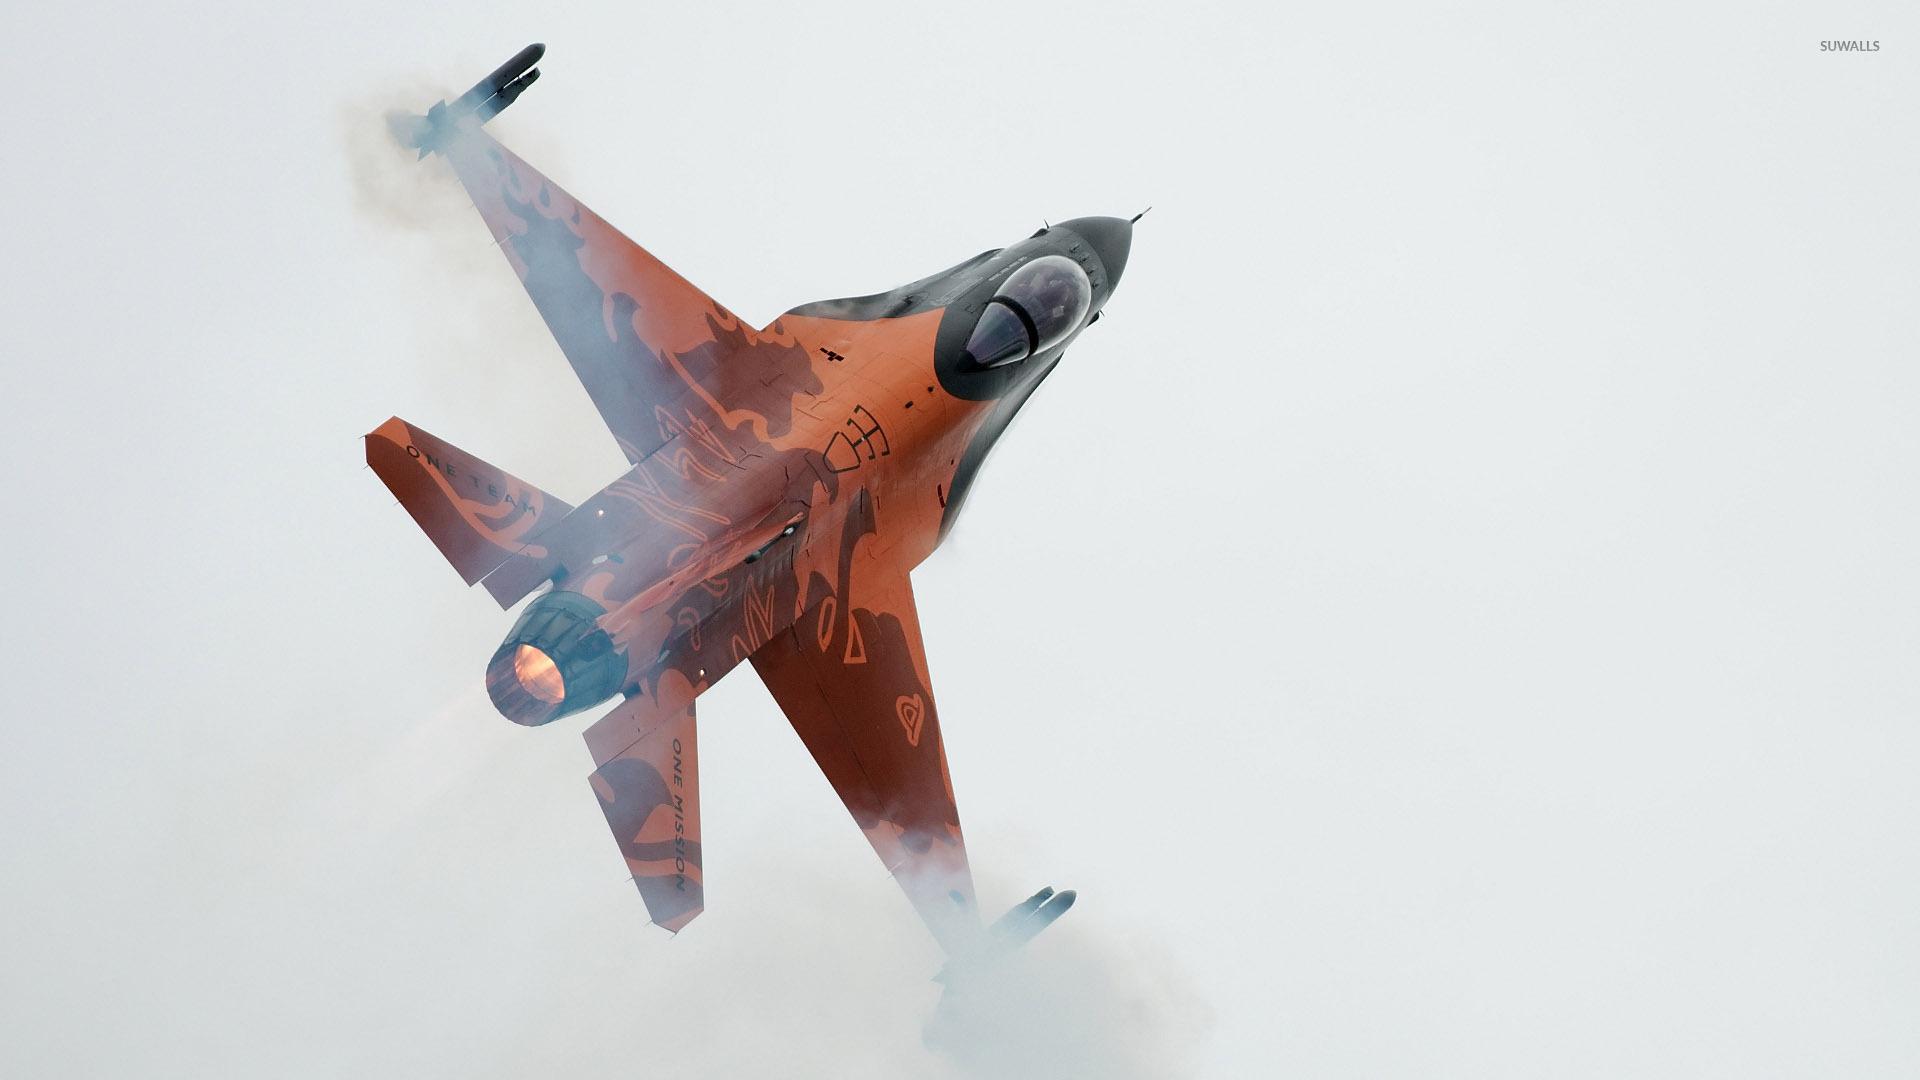 авиация самолет желтый F-16 Fighting Falcon  № 3755525 бесплатно